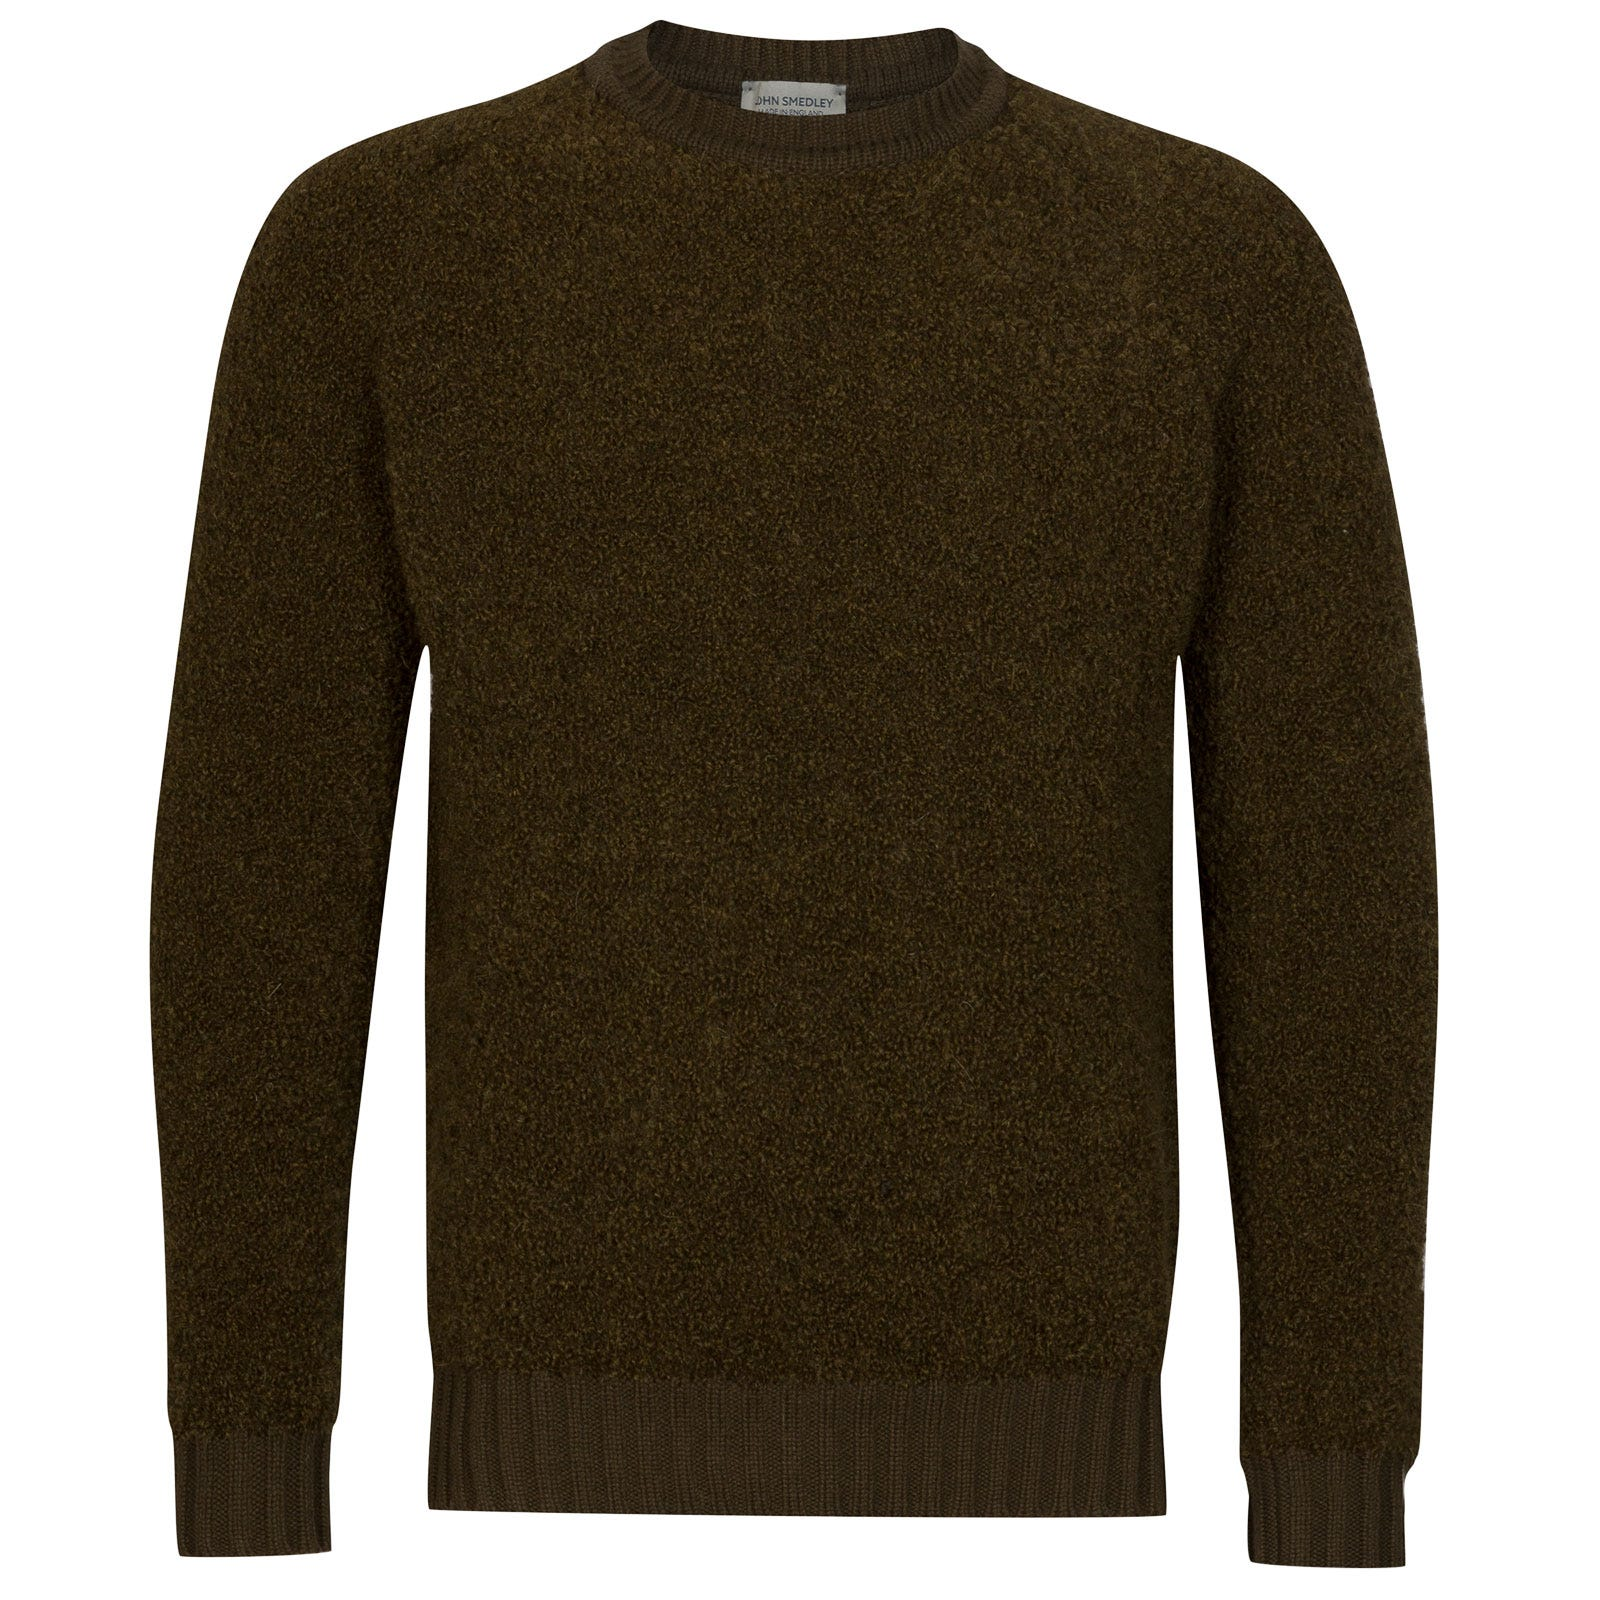 John Smedley Moss Alpaca & Wool Pullover in Kielder Green-XL